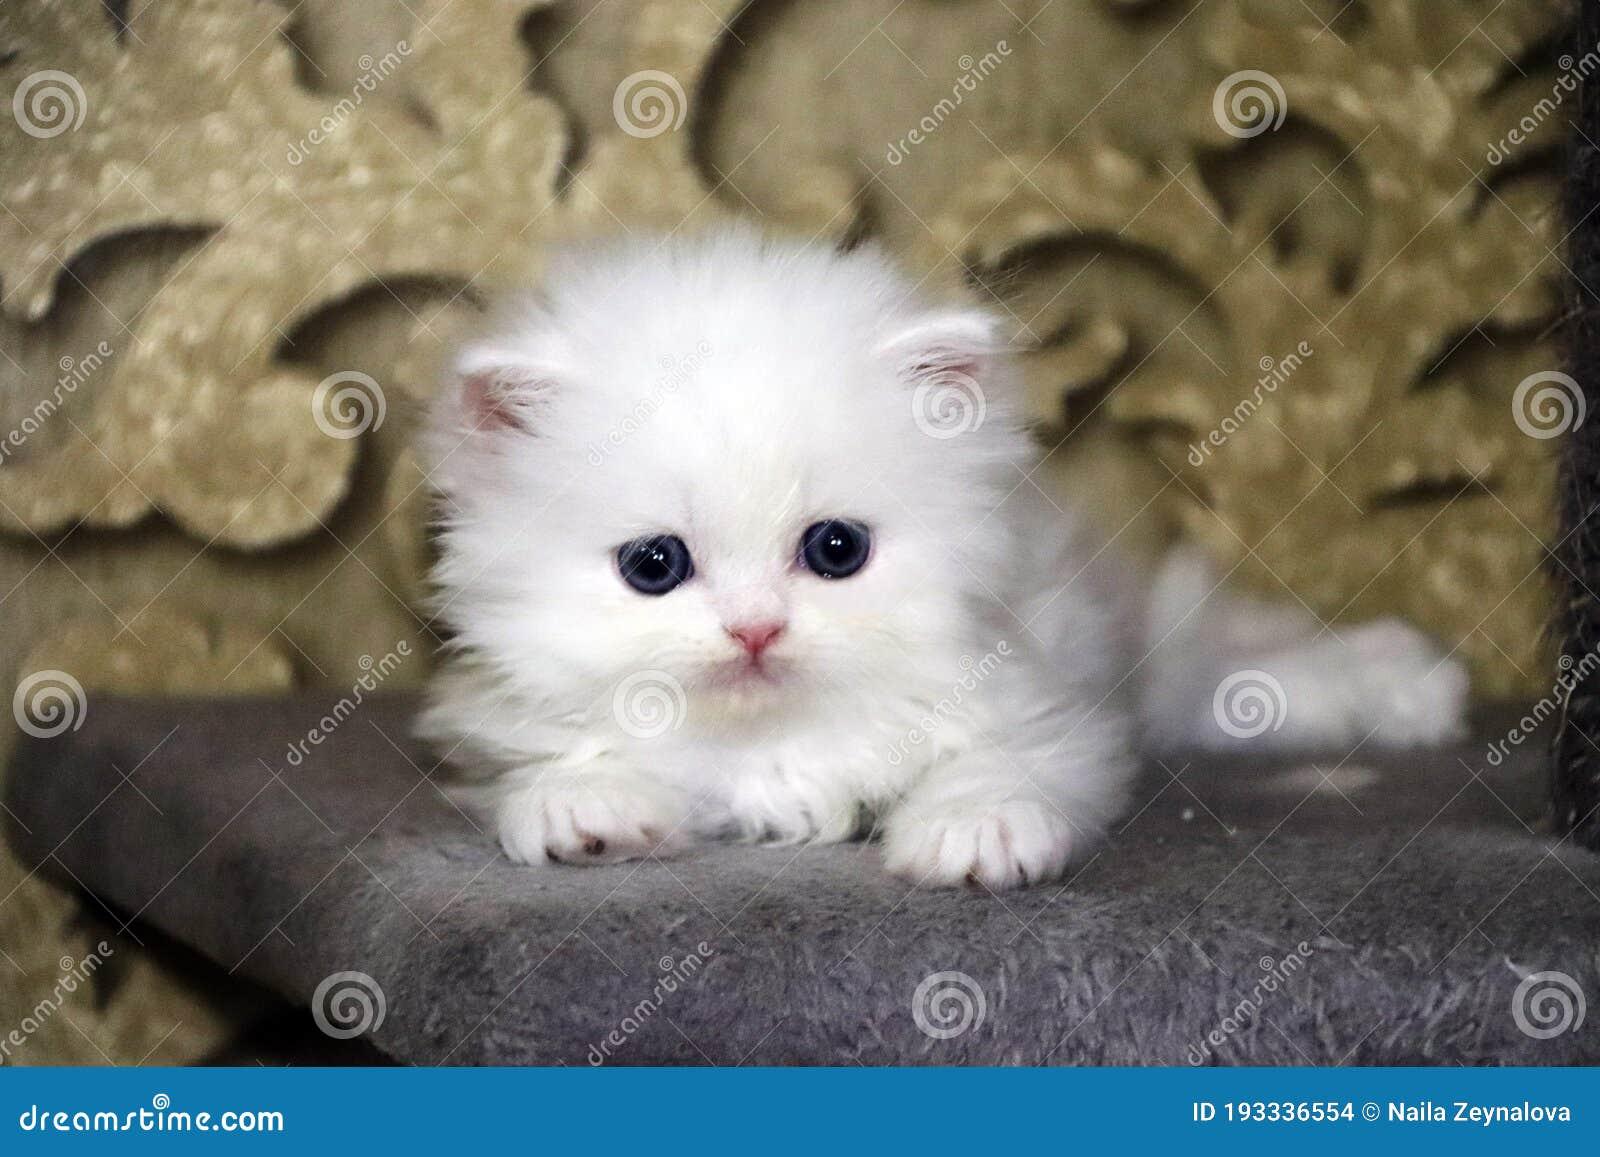 kitty cat)